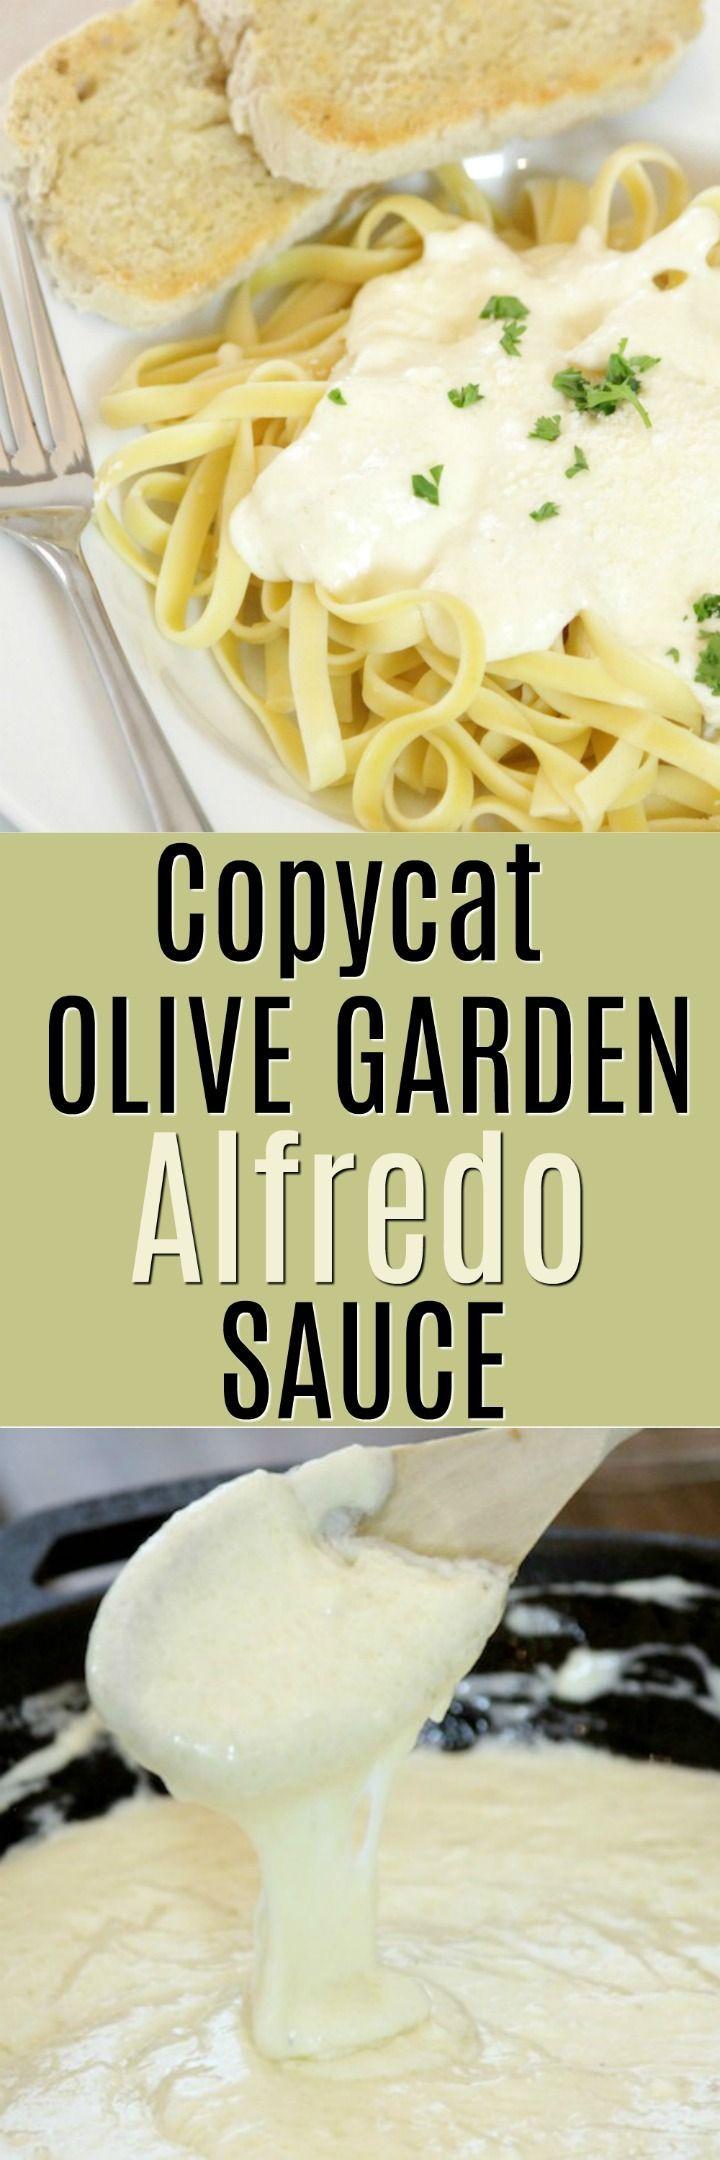 How to make Copycat Olive Garden Fettuccini Alfredo Sauce  #olivegarden #pasta #sauce #copycat #copycatrecipe #alfredo #fettuccini #easyitalian #italianfood #italianrecipes #italy #easydinner #quickdinner #quickandeasy